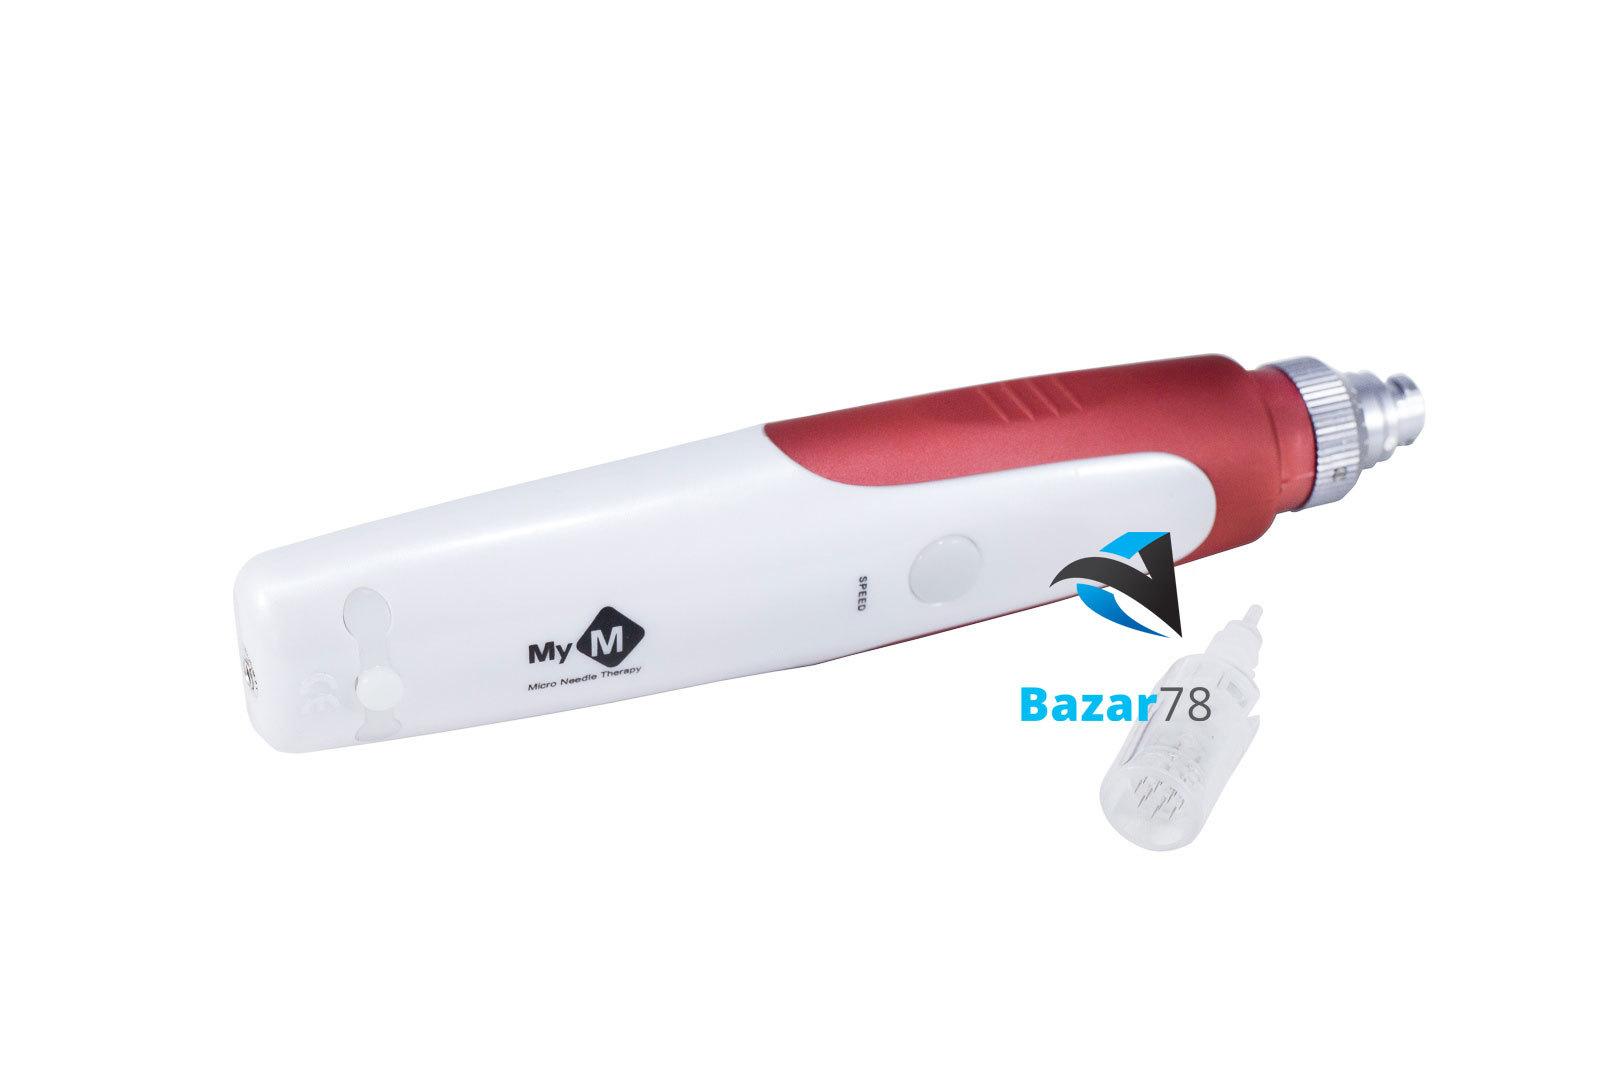 Аппарат для BB Glow фракционной мезотерапии My-M (Ultima )